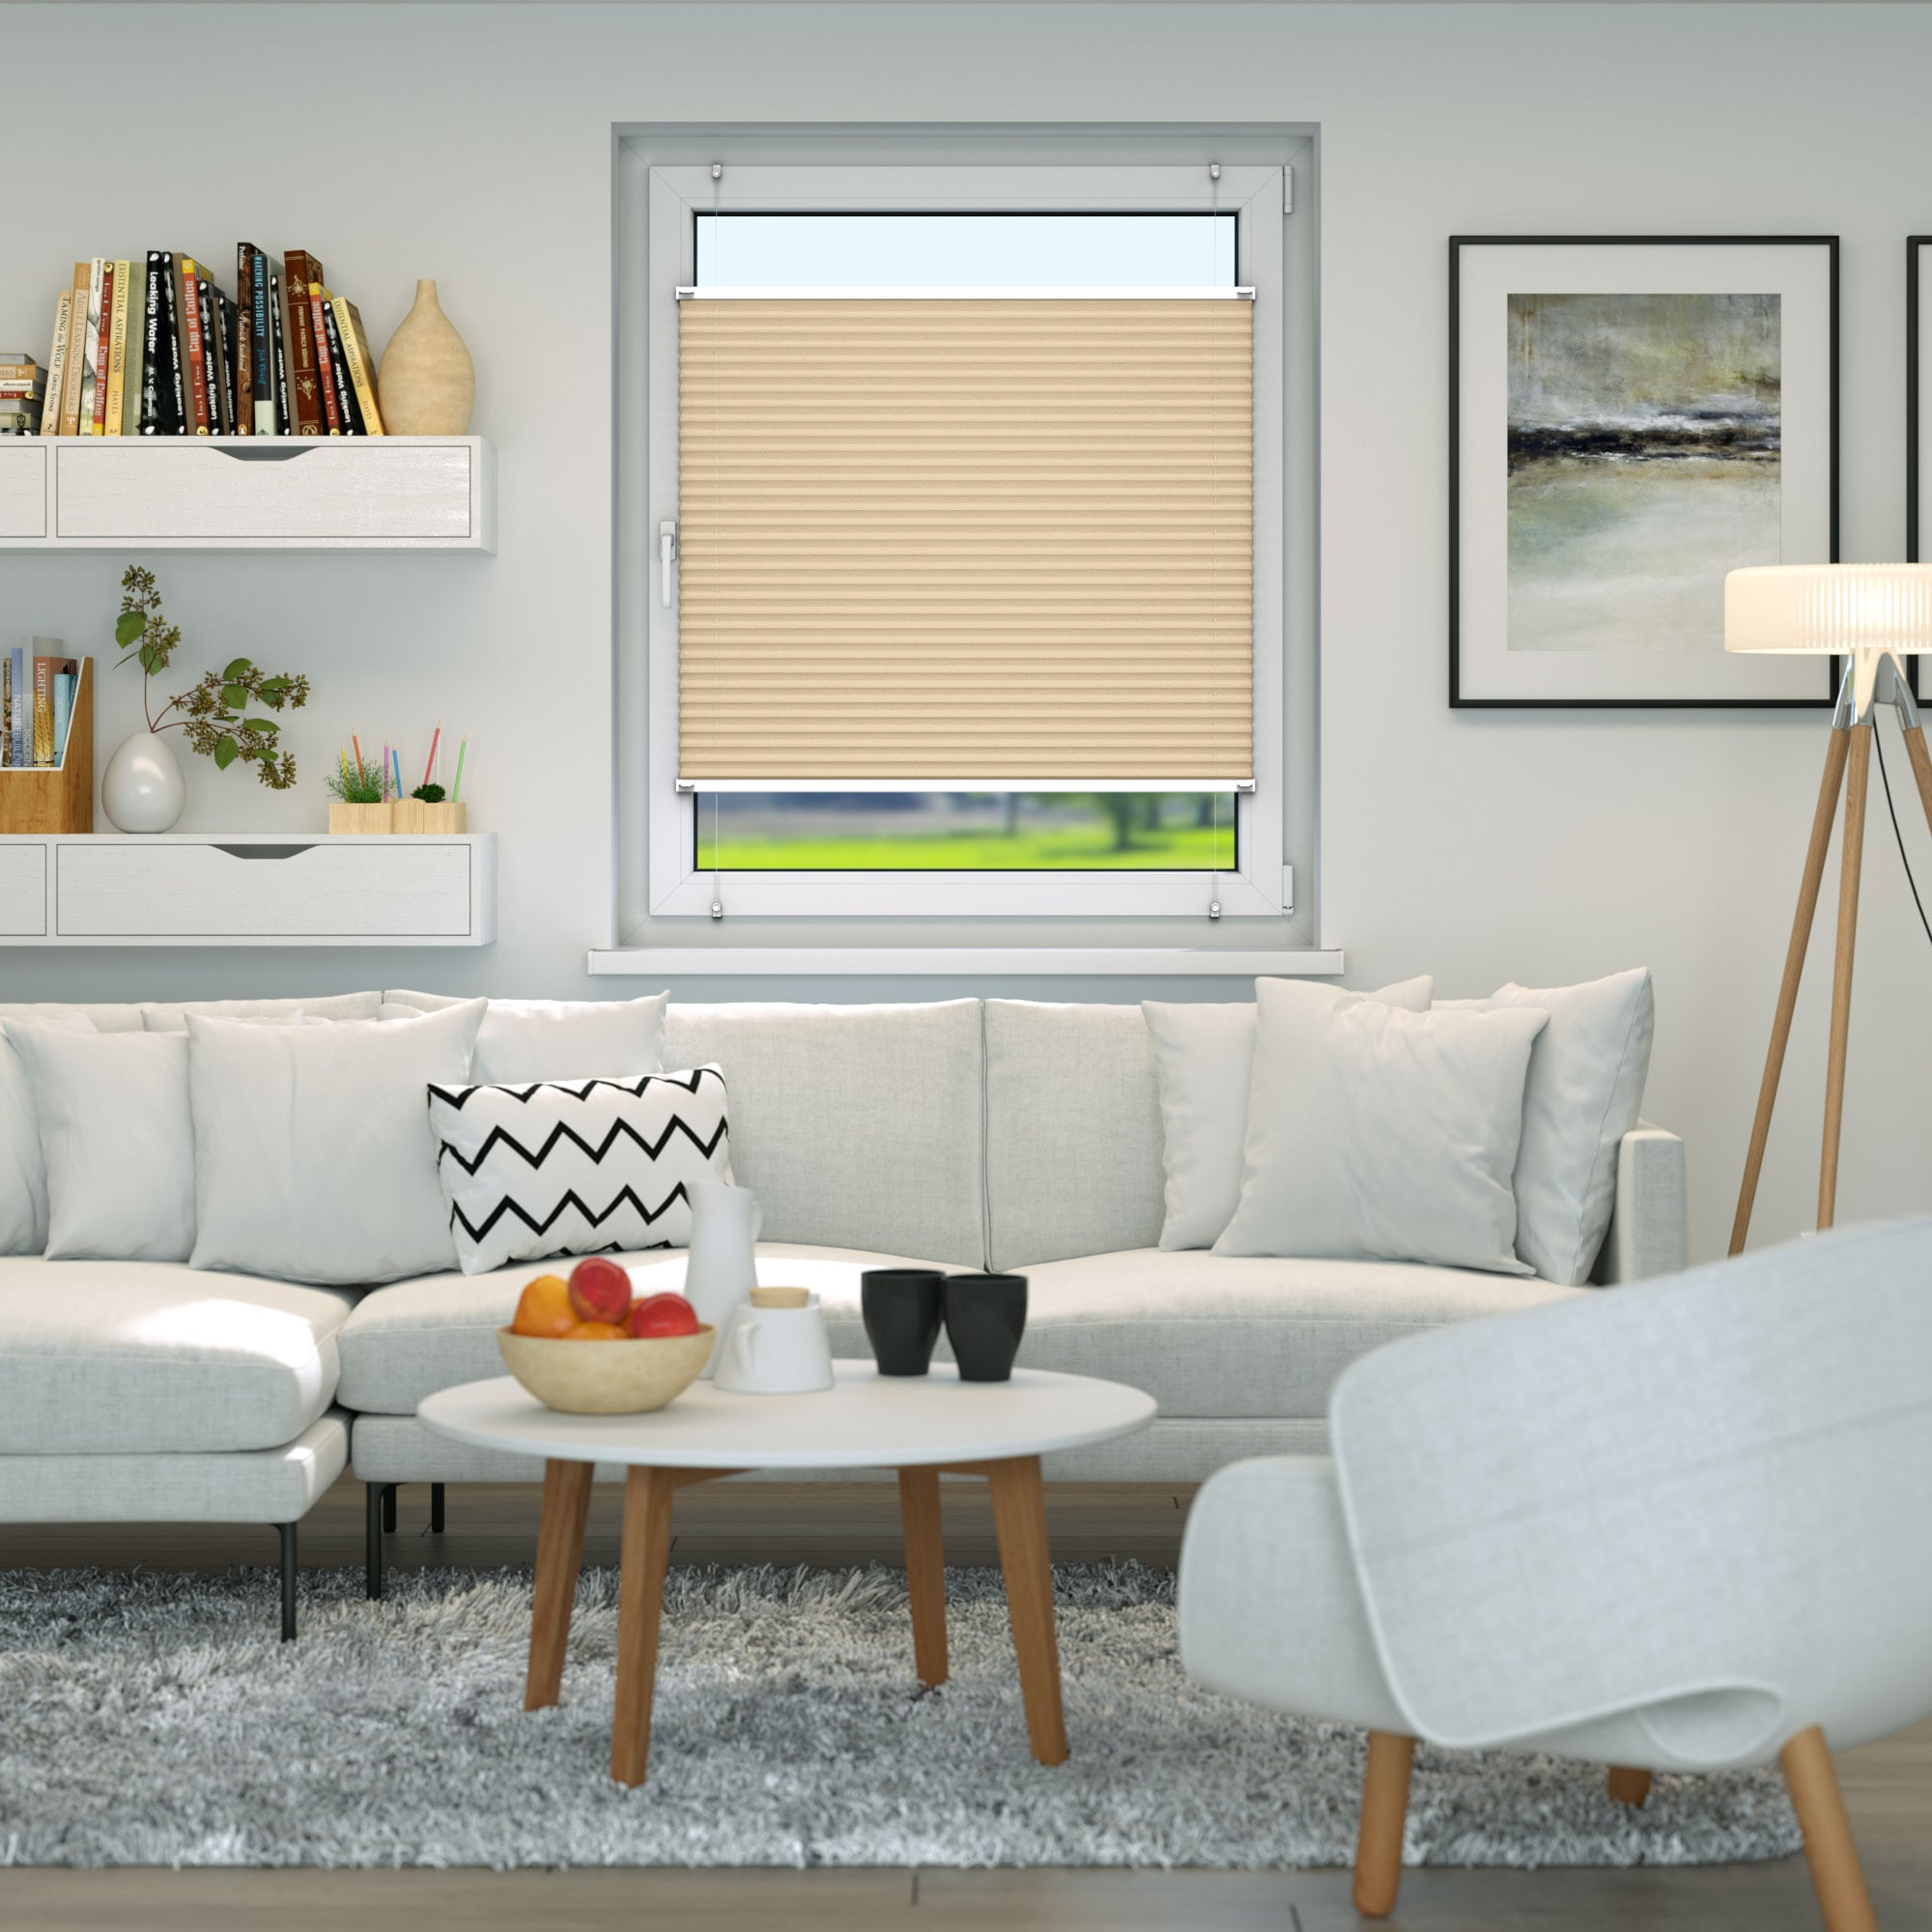 Klemmfix-Plissee-Faltrollo-ohne-Bohren-Fenster-Tuer-Plisseerollo-Plisee-Easyfix Indexbild 12